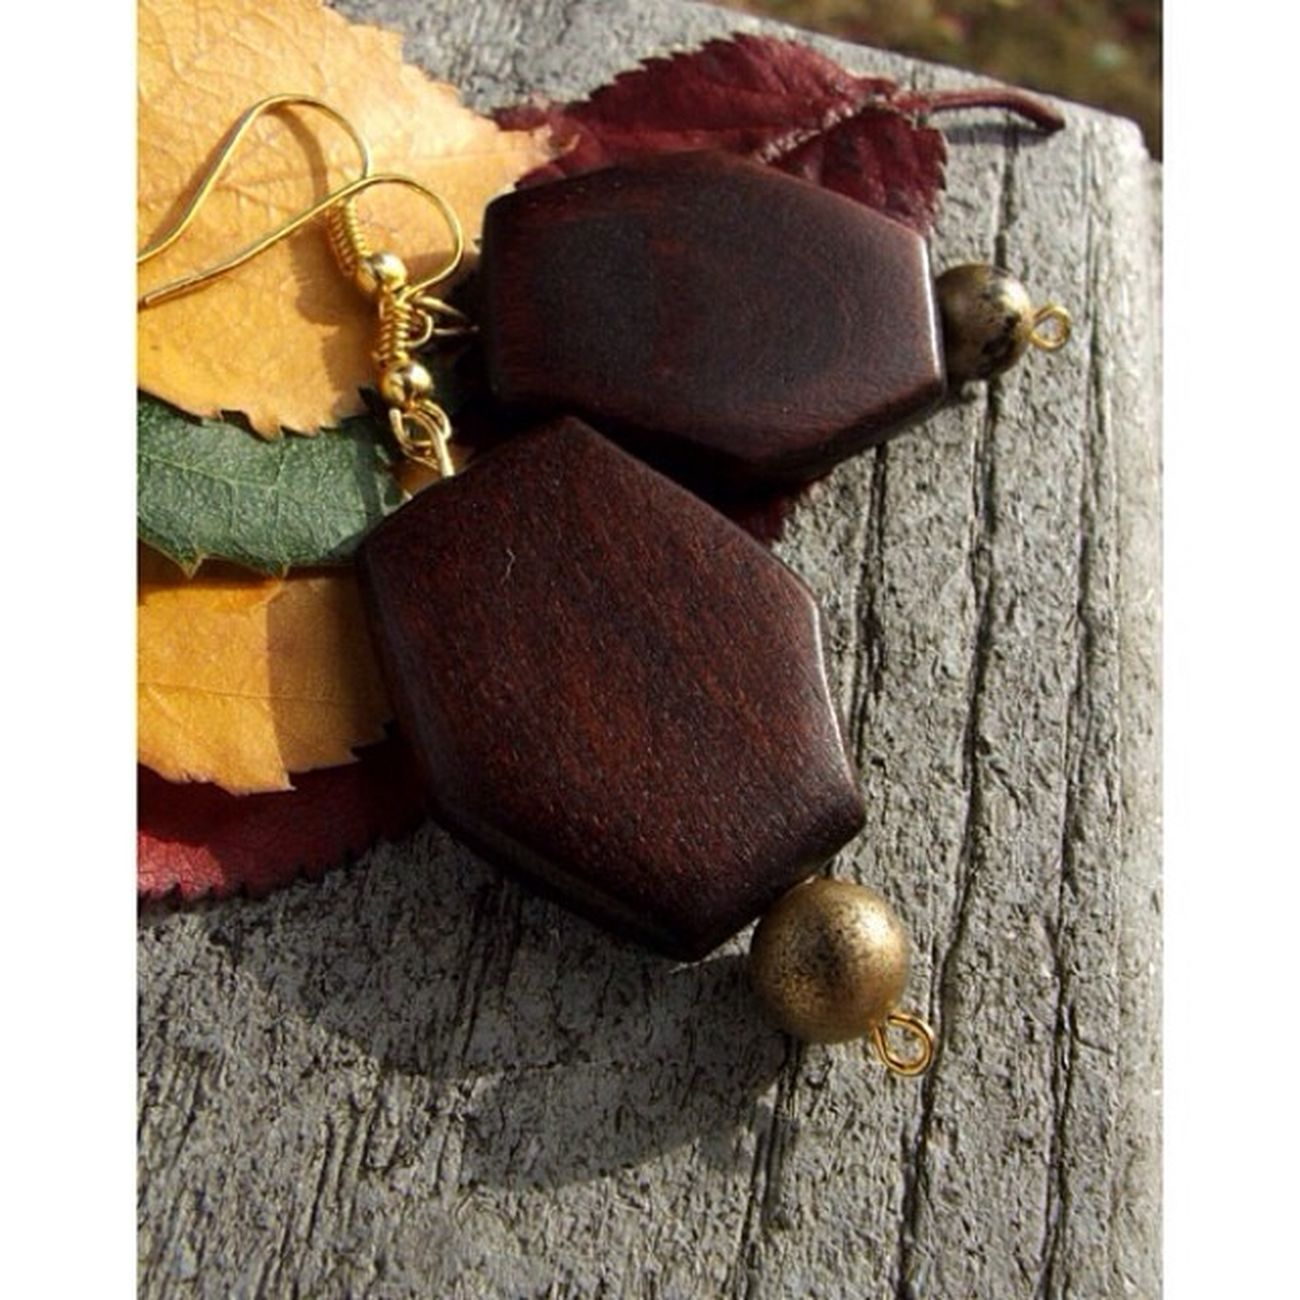 Getting back into expressing myself through Jewelrymaking ? Jewelry Handmade Madewithlove theradblackkids